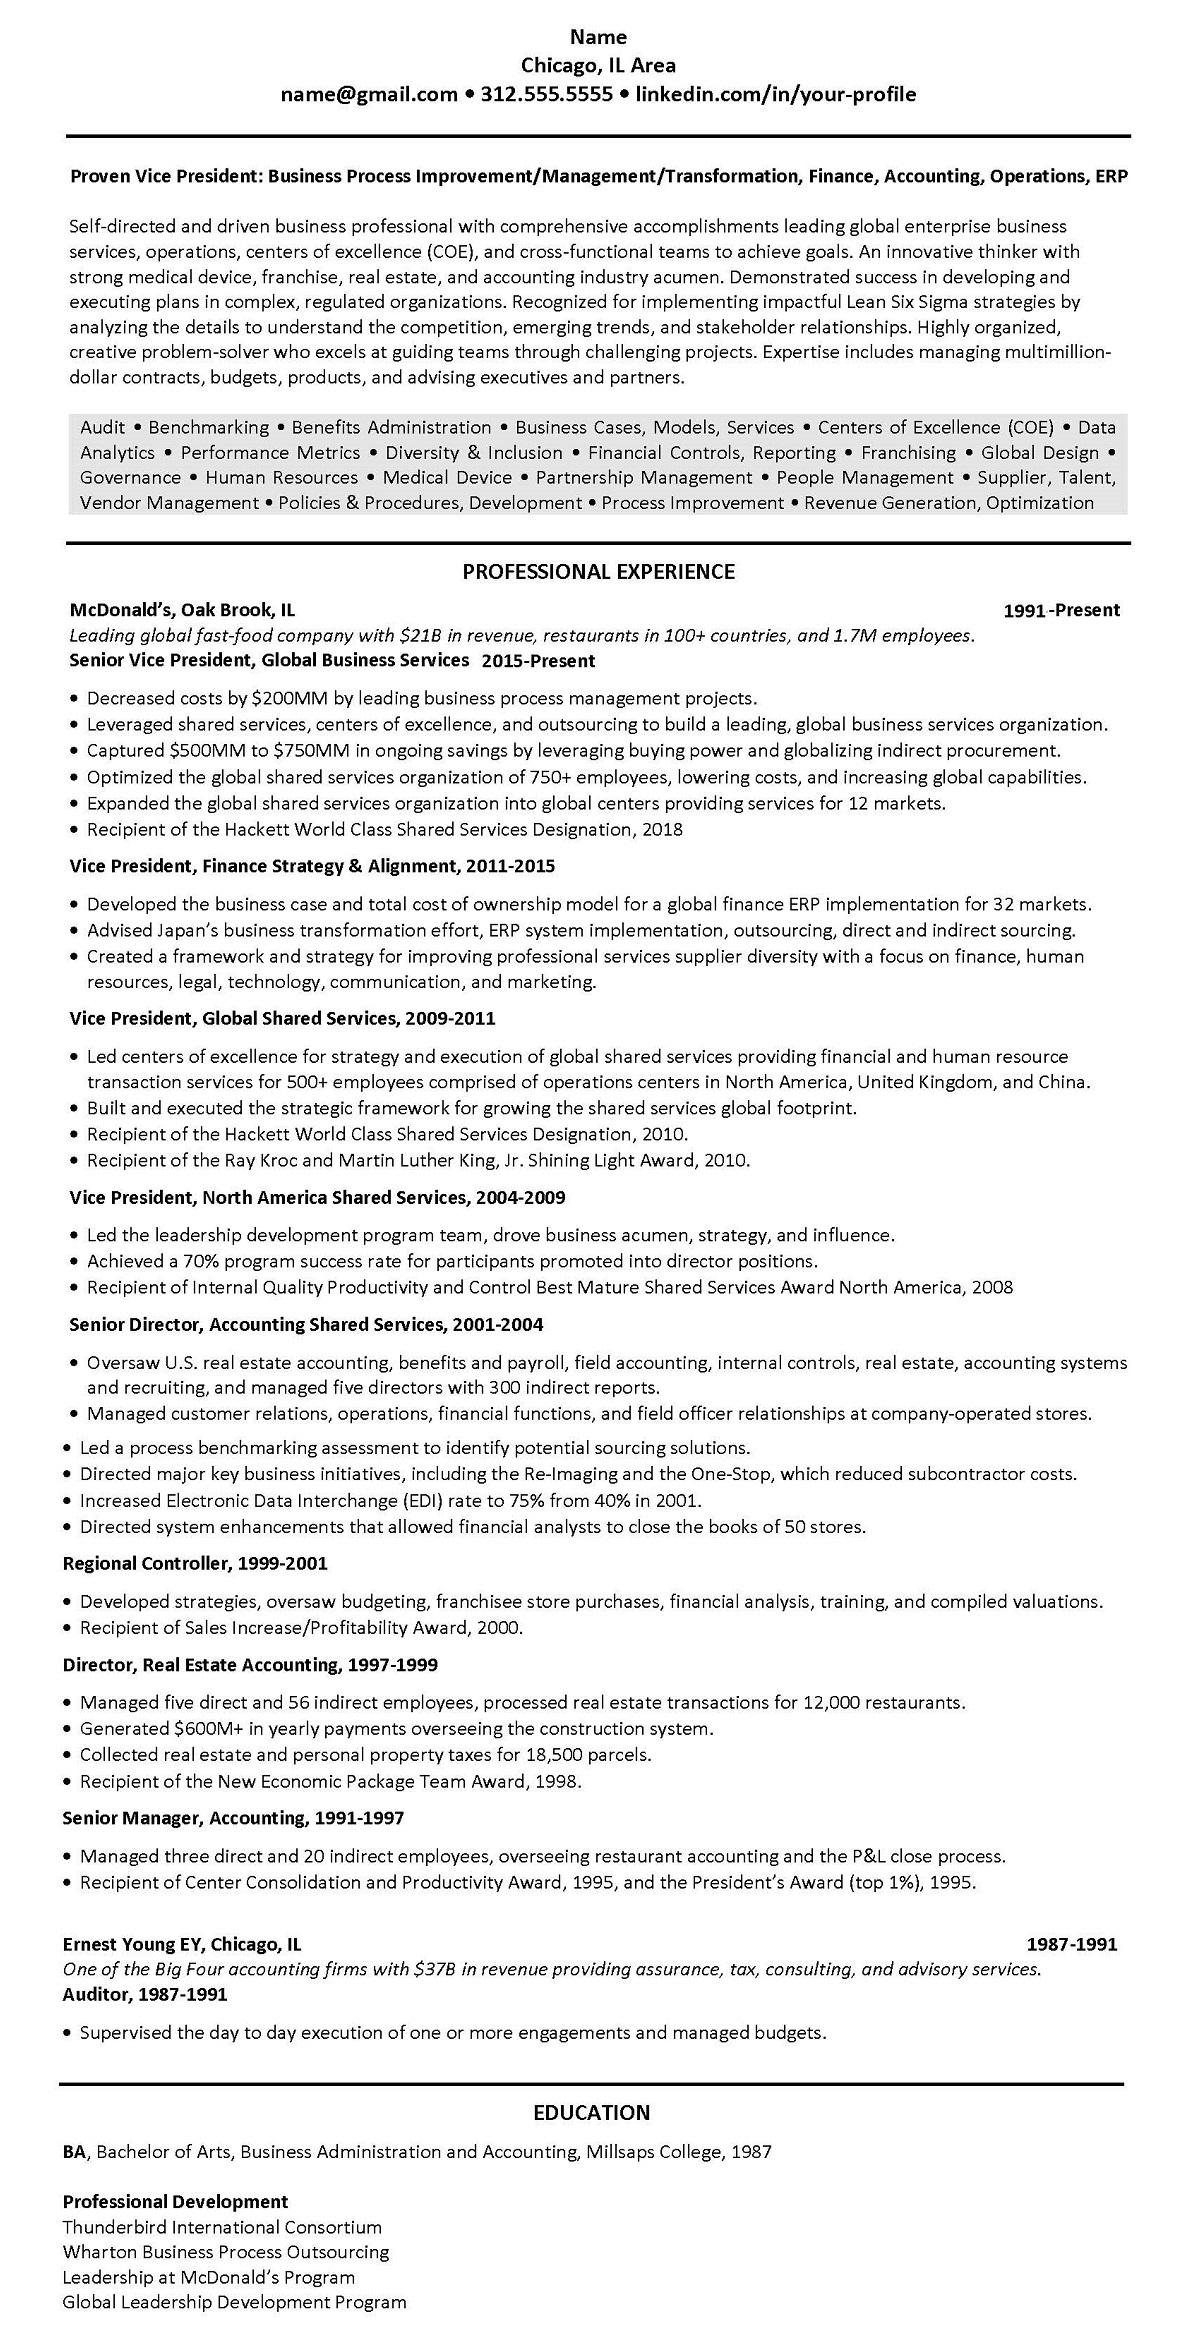 Resume 3203 Mcdonalds Ey Only